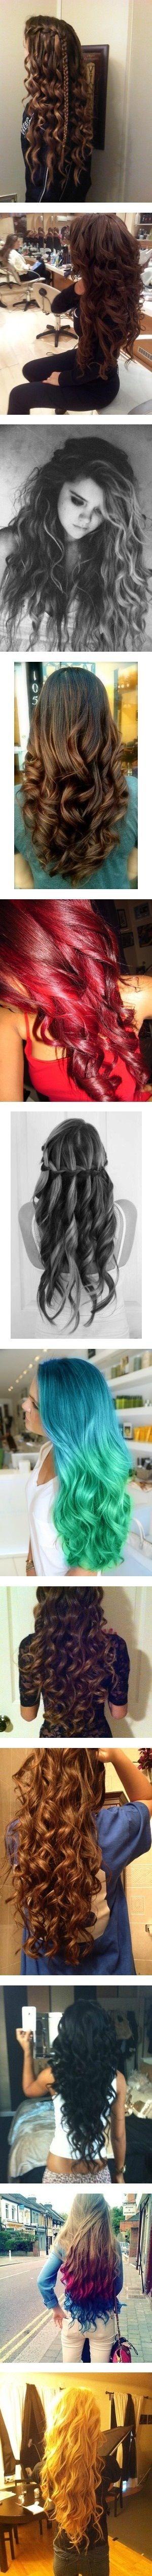 Long hair+curls